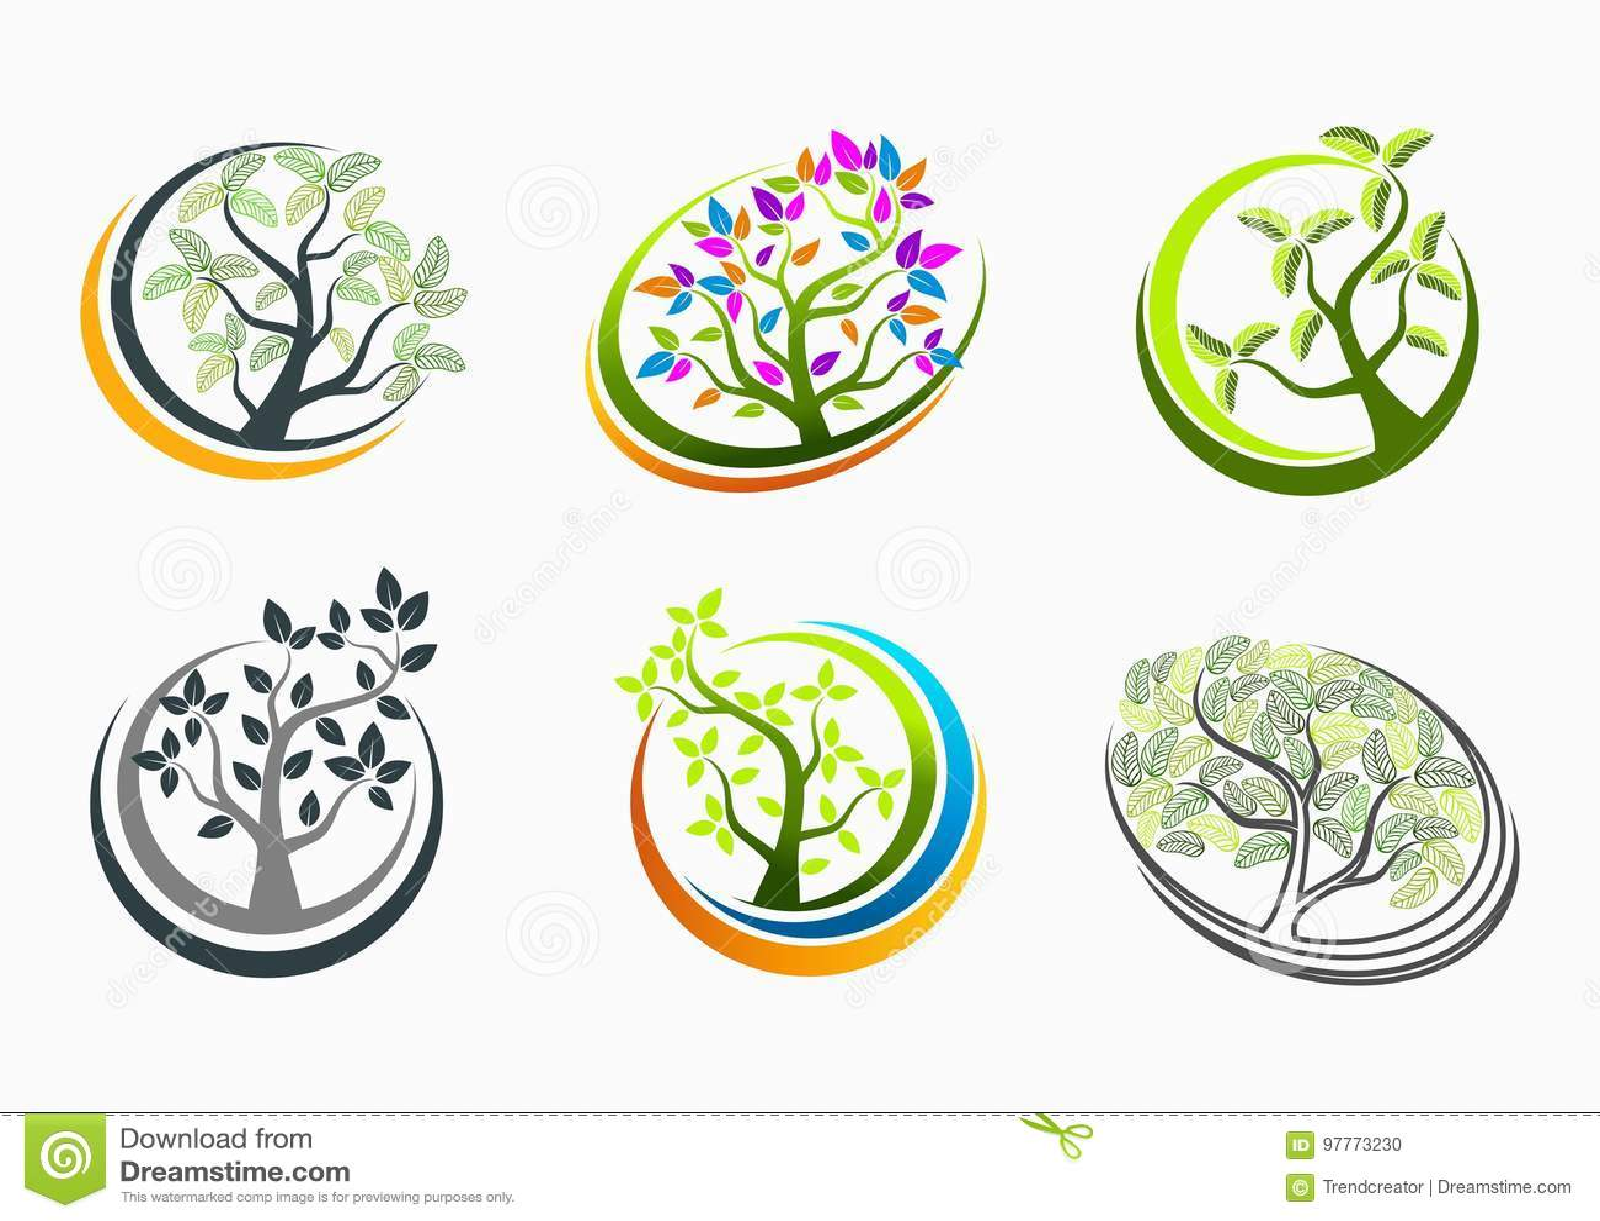 Tree health,logo,nature,spa,sign,massage,icon,plant,symbol,yoga and growth education concept design